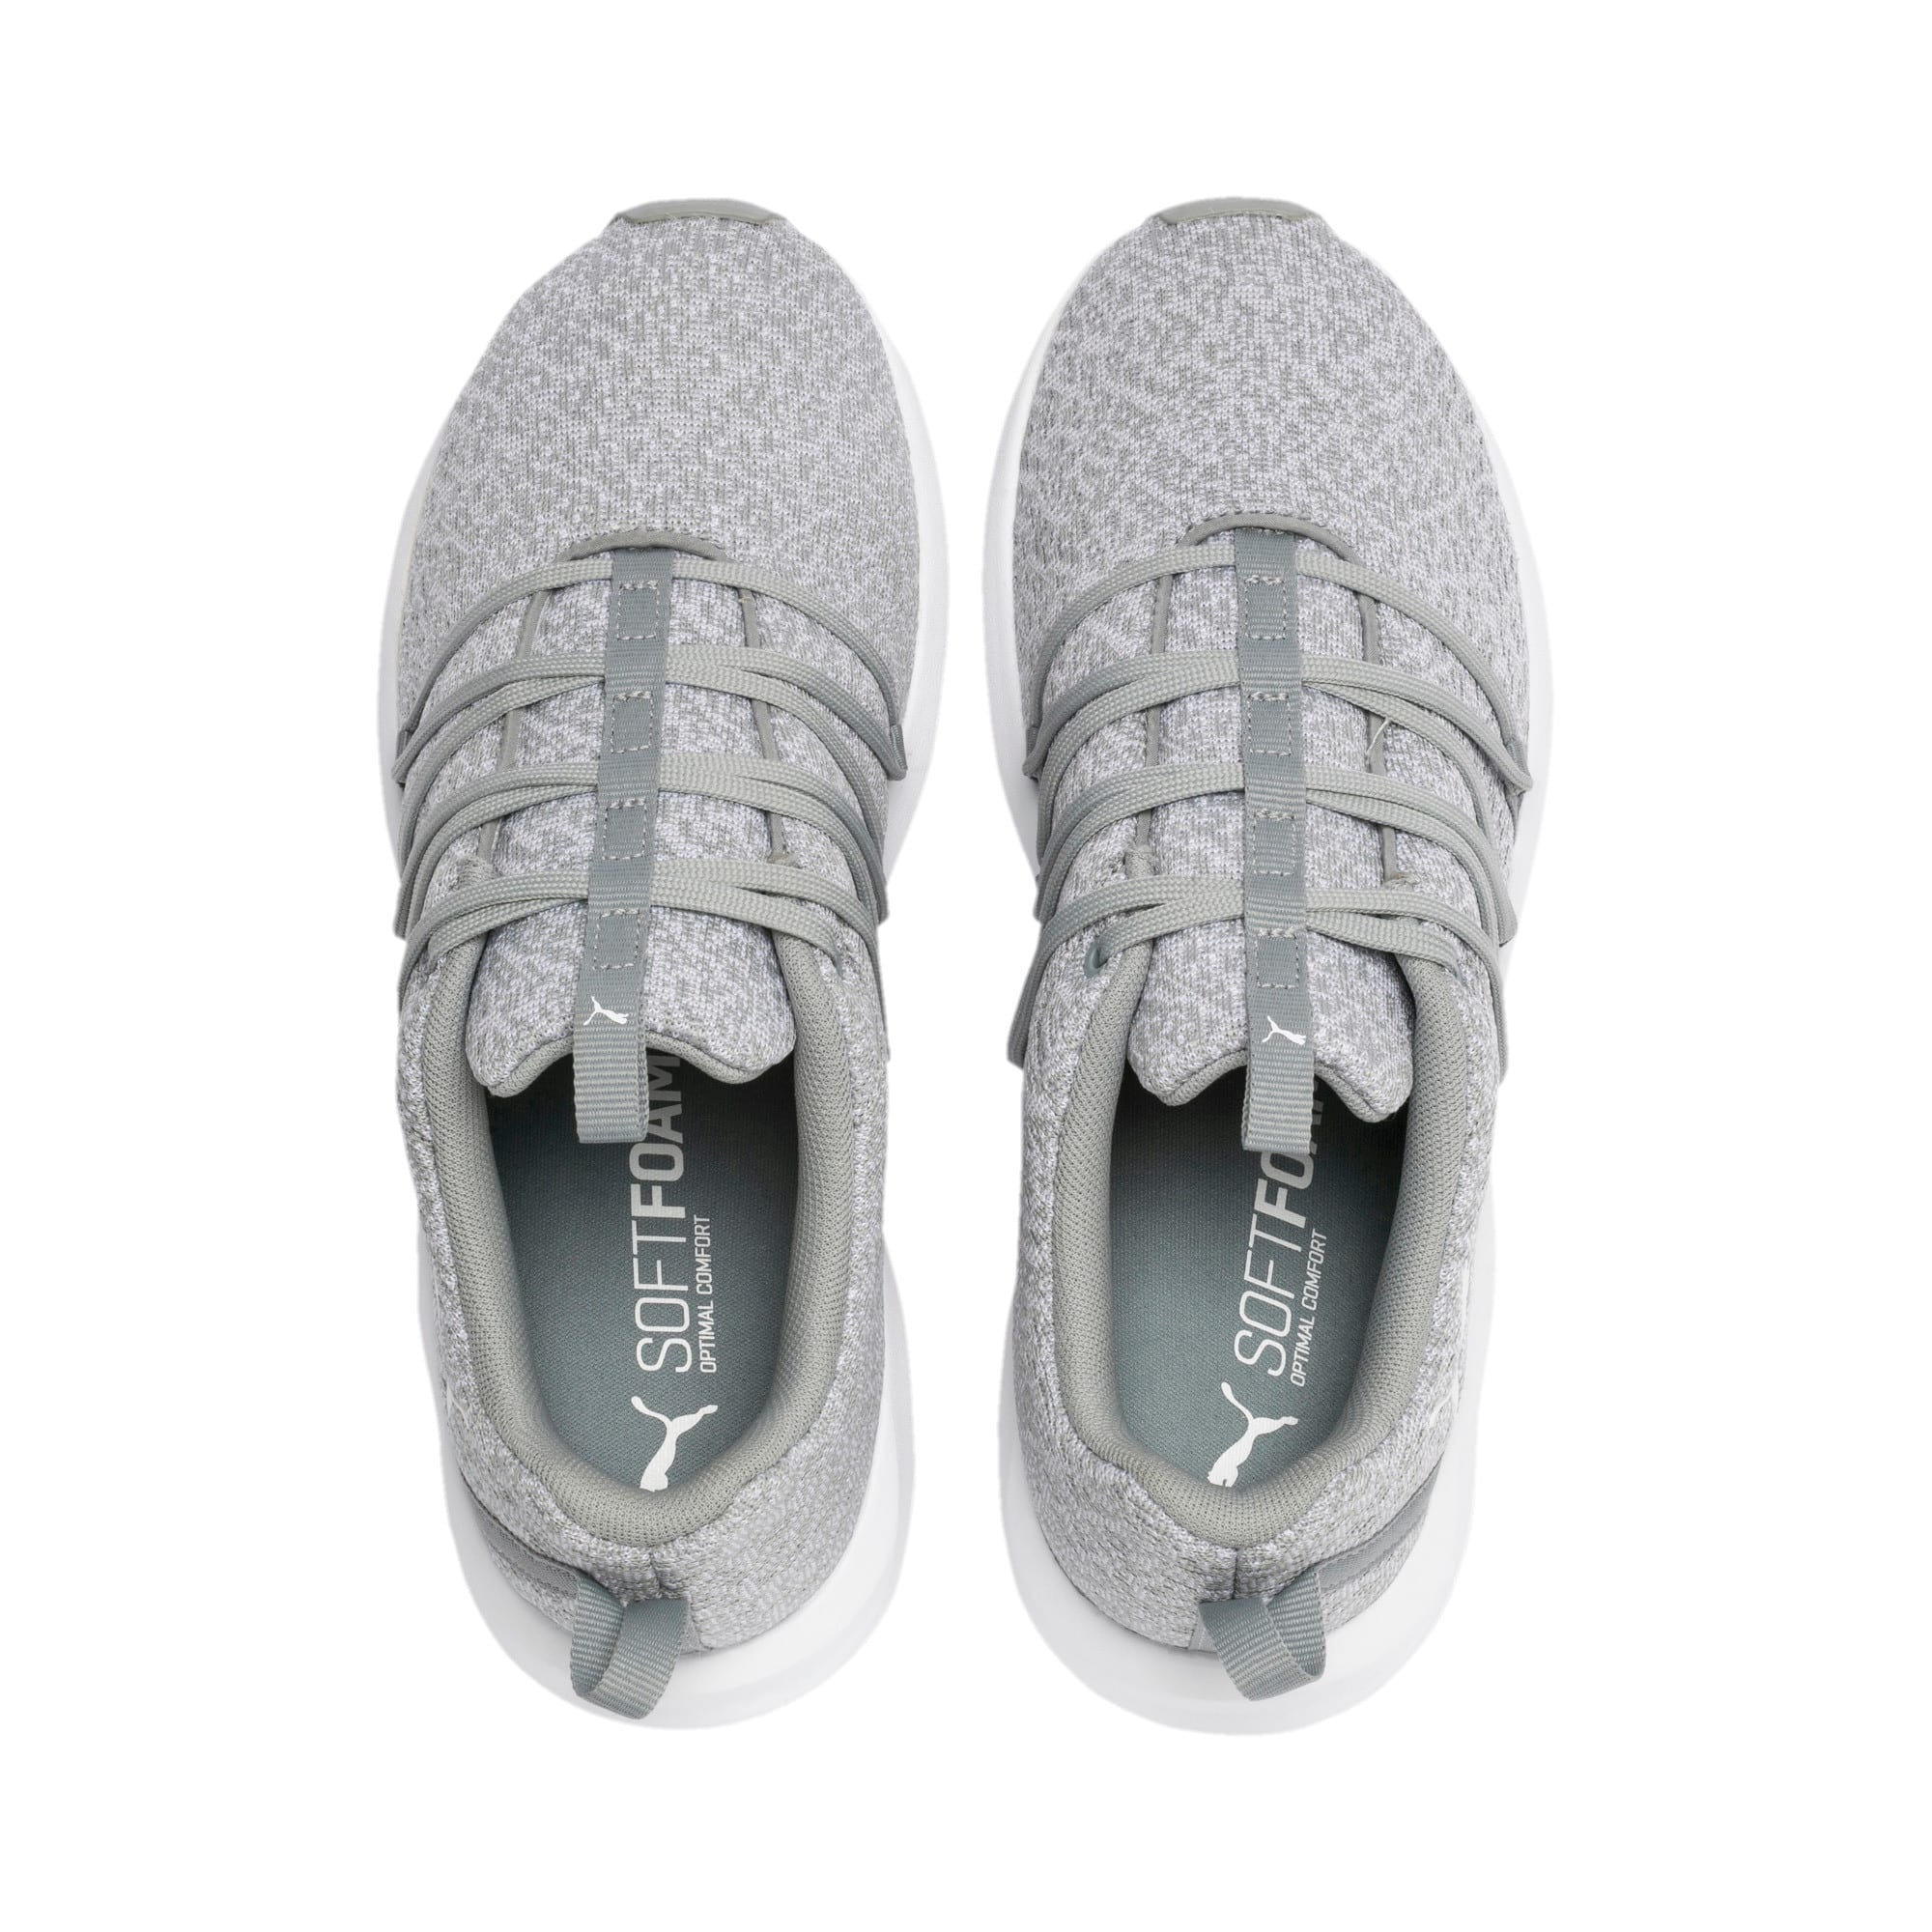 Thumbnail 6 of Prowl Alt Knit Women's Training Shoes, Quarry-Puma White, medium